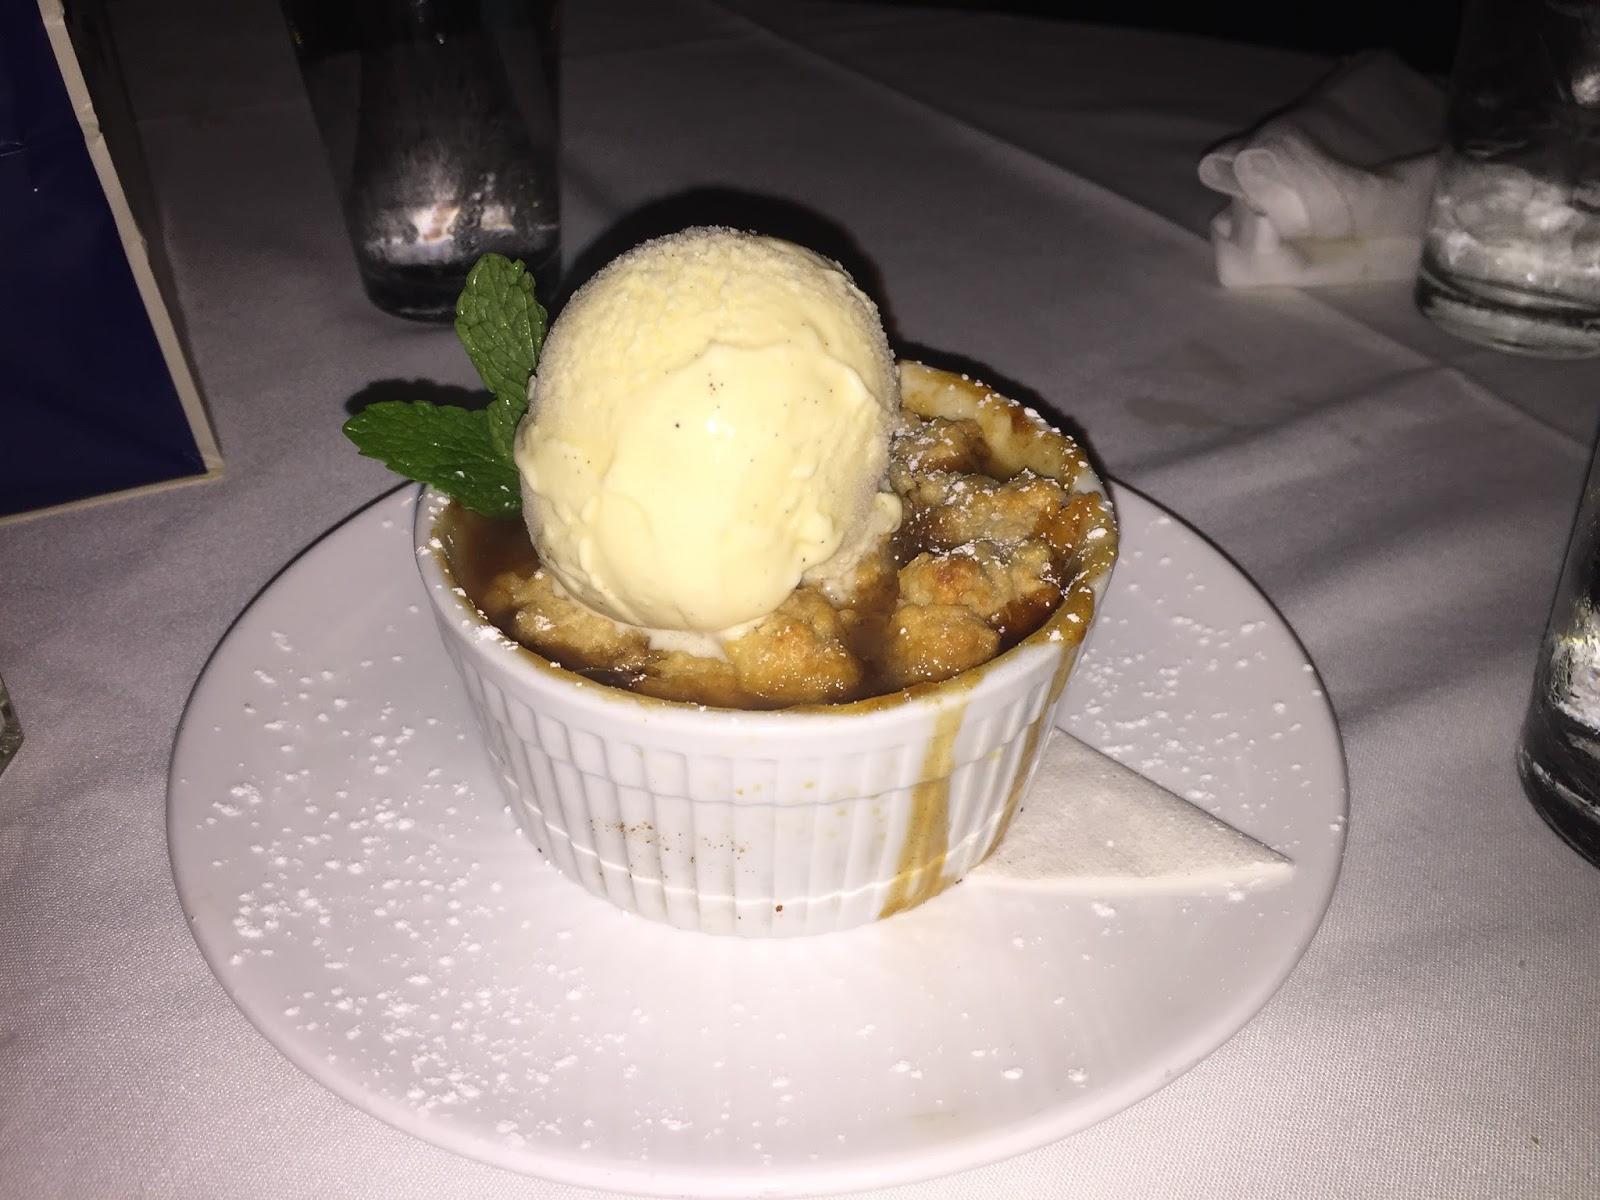 Peach Cobbler Dessert at Ibiza